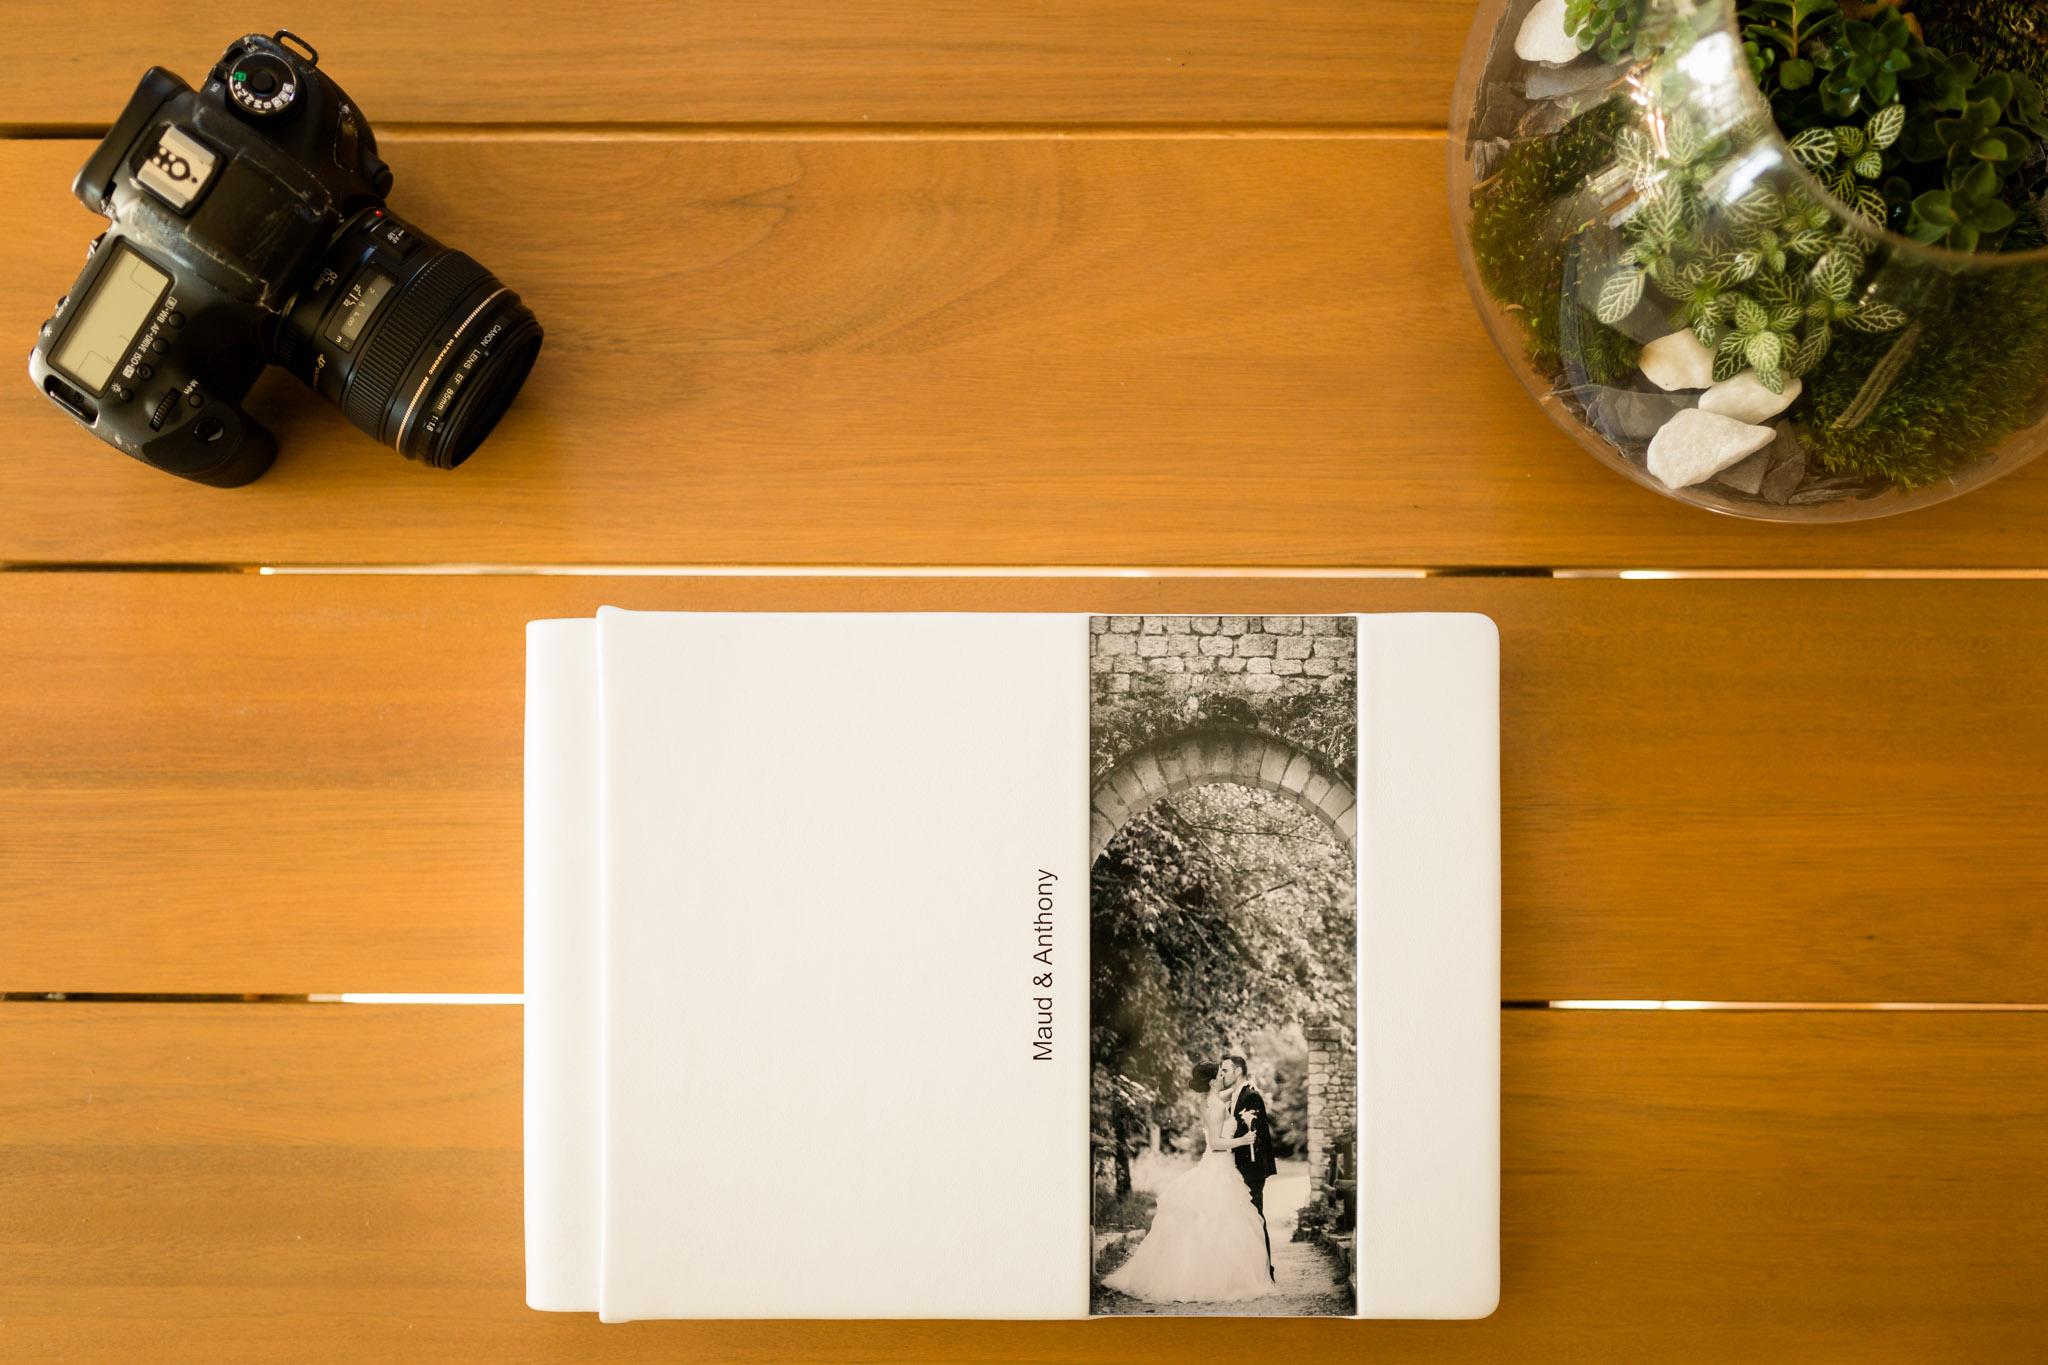 livre-photo-mariage-cuir-photographe-bordeaux-gironde-33_01